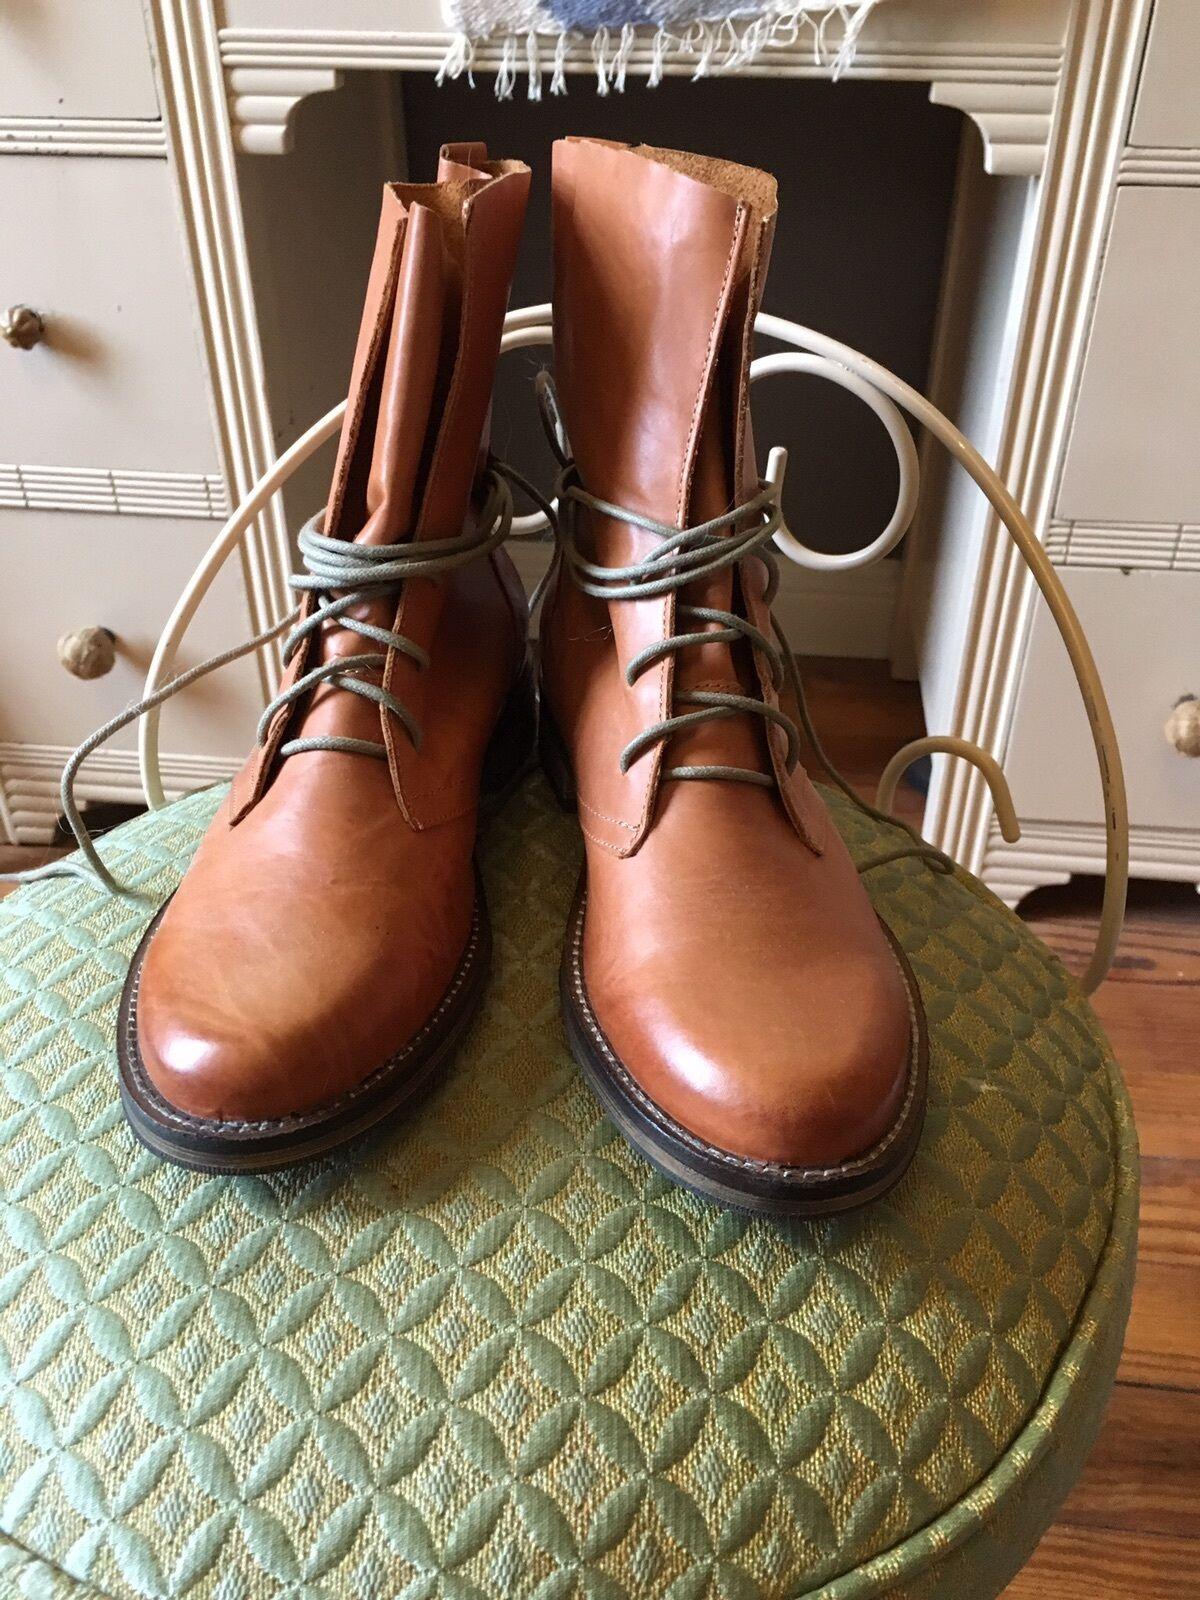 Chelsea Crew Fabio 2 Leather Boots, Tan US Size 7 7 7 58ea93